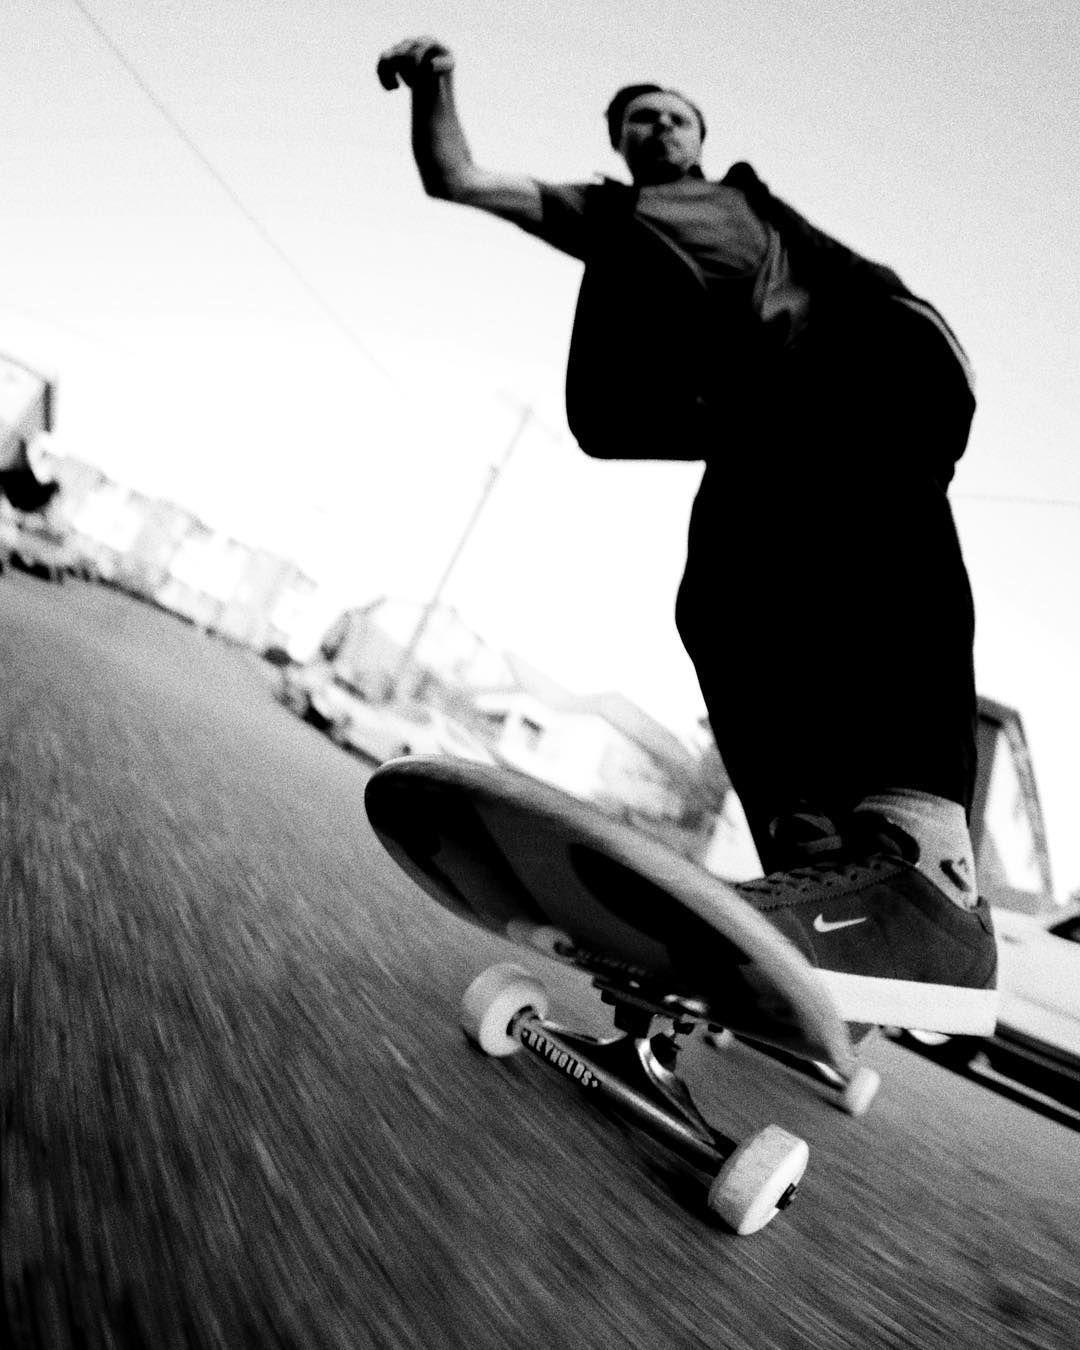 greenwouldge sliding  Shot for @boneswheels and @ccs